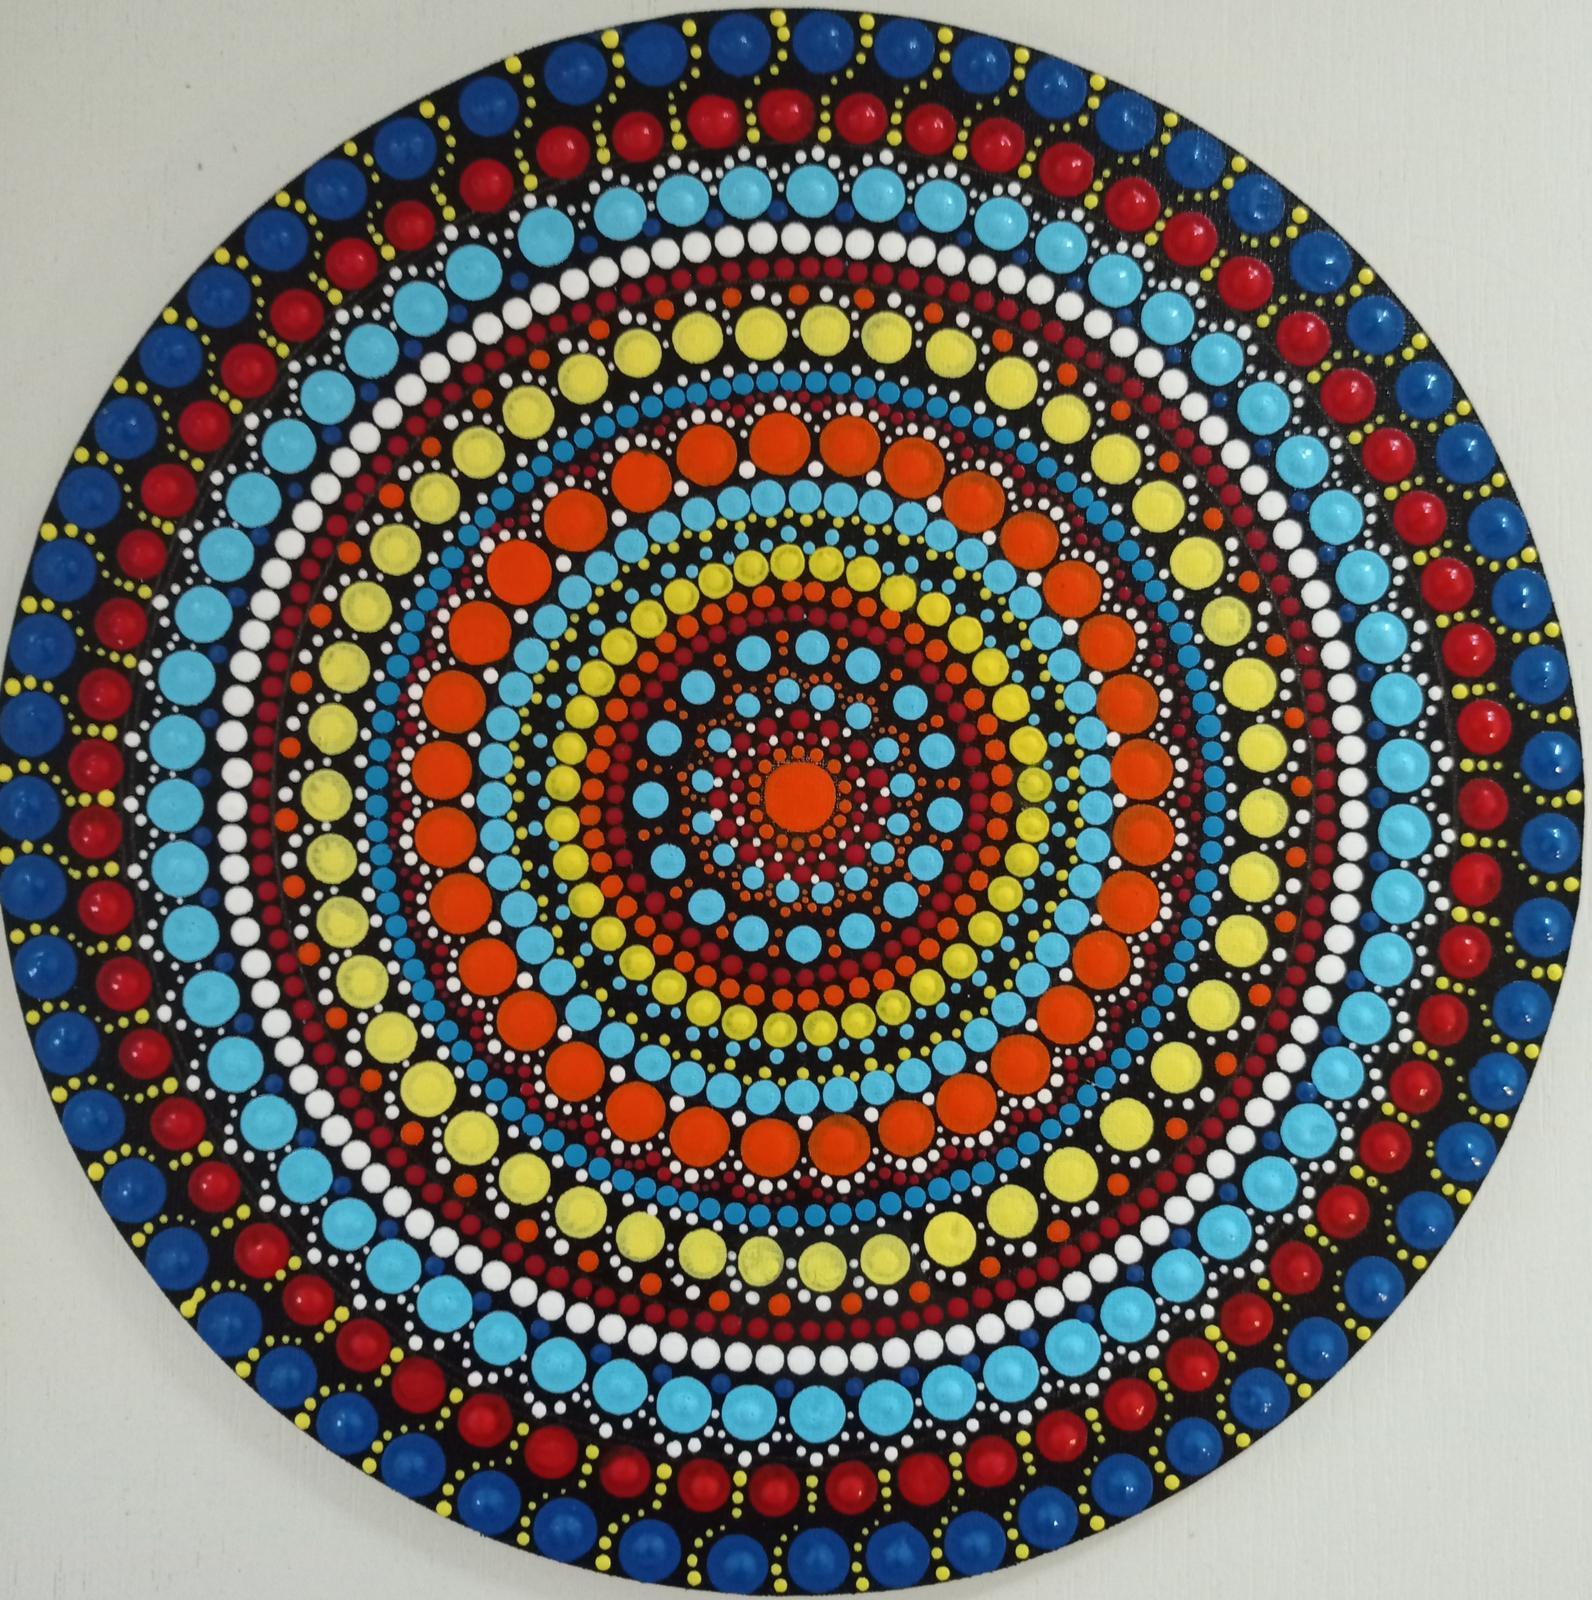 Farebná mandala - Obrázok č. 1